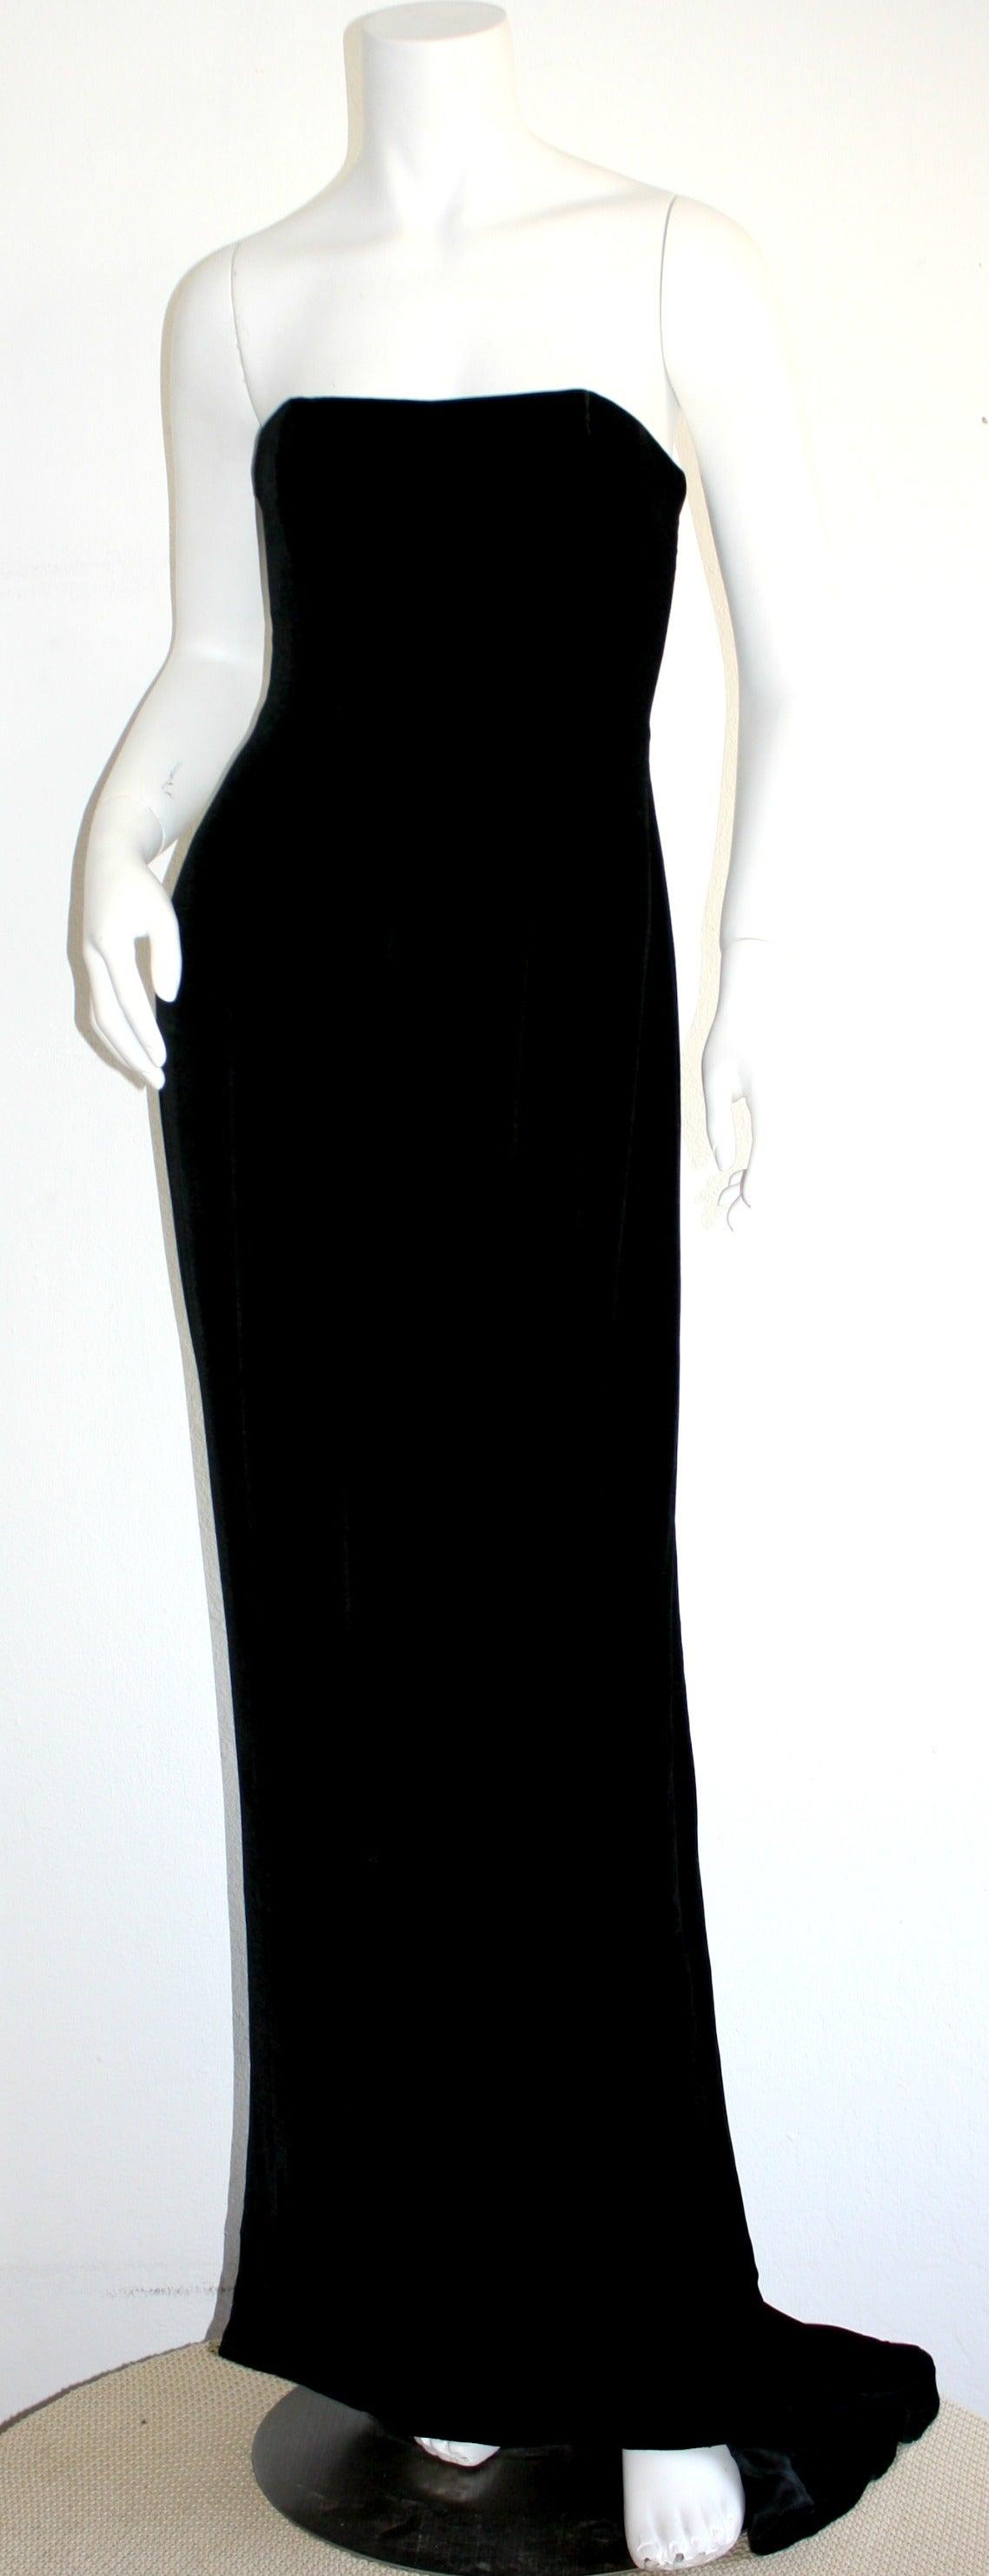 Women's Stunning 1990s James Purcell Black Silk Velvet Strapless Gown w/ Dramatic Train For Sale